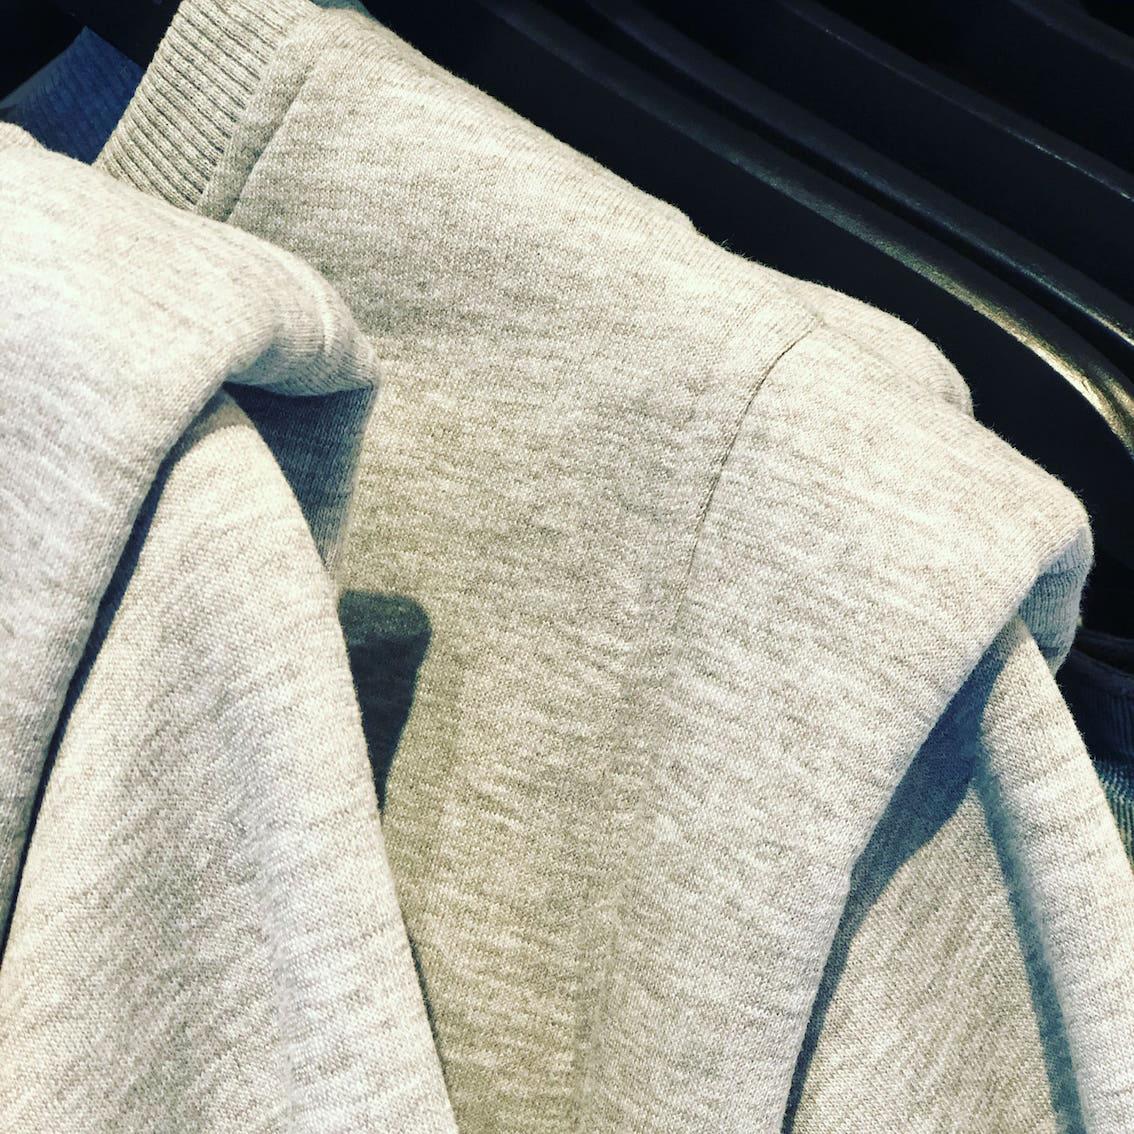 Nieuwe fashion vormen   ENJOY! The Good Life